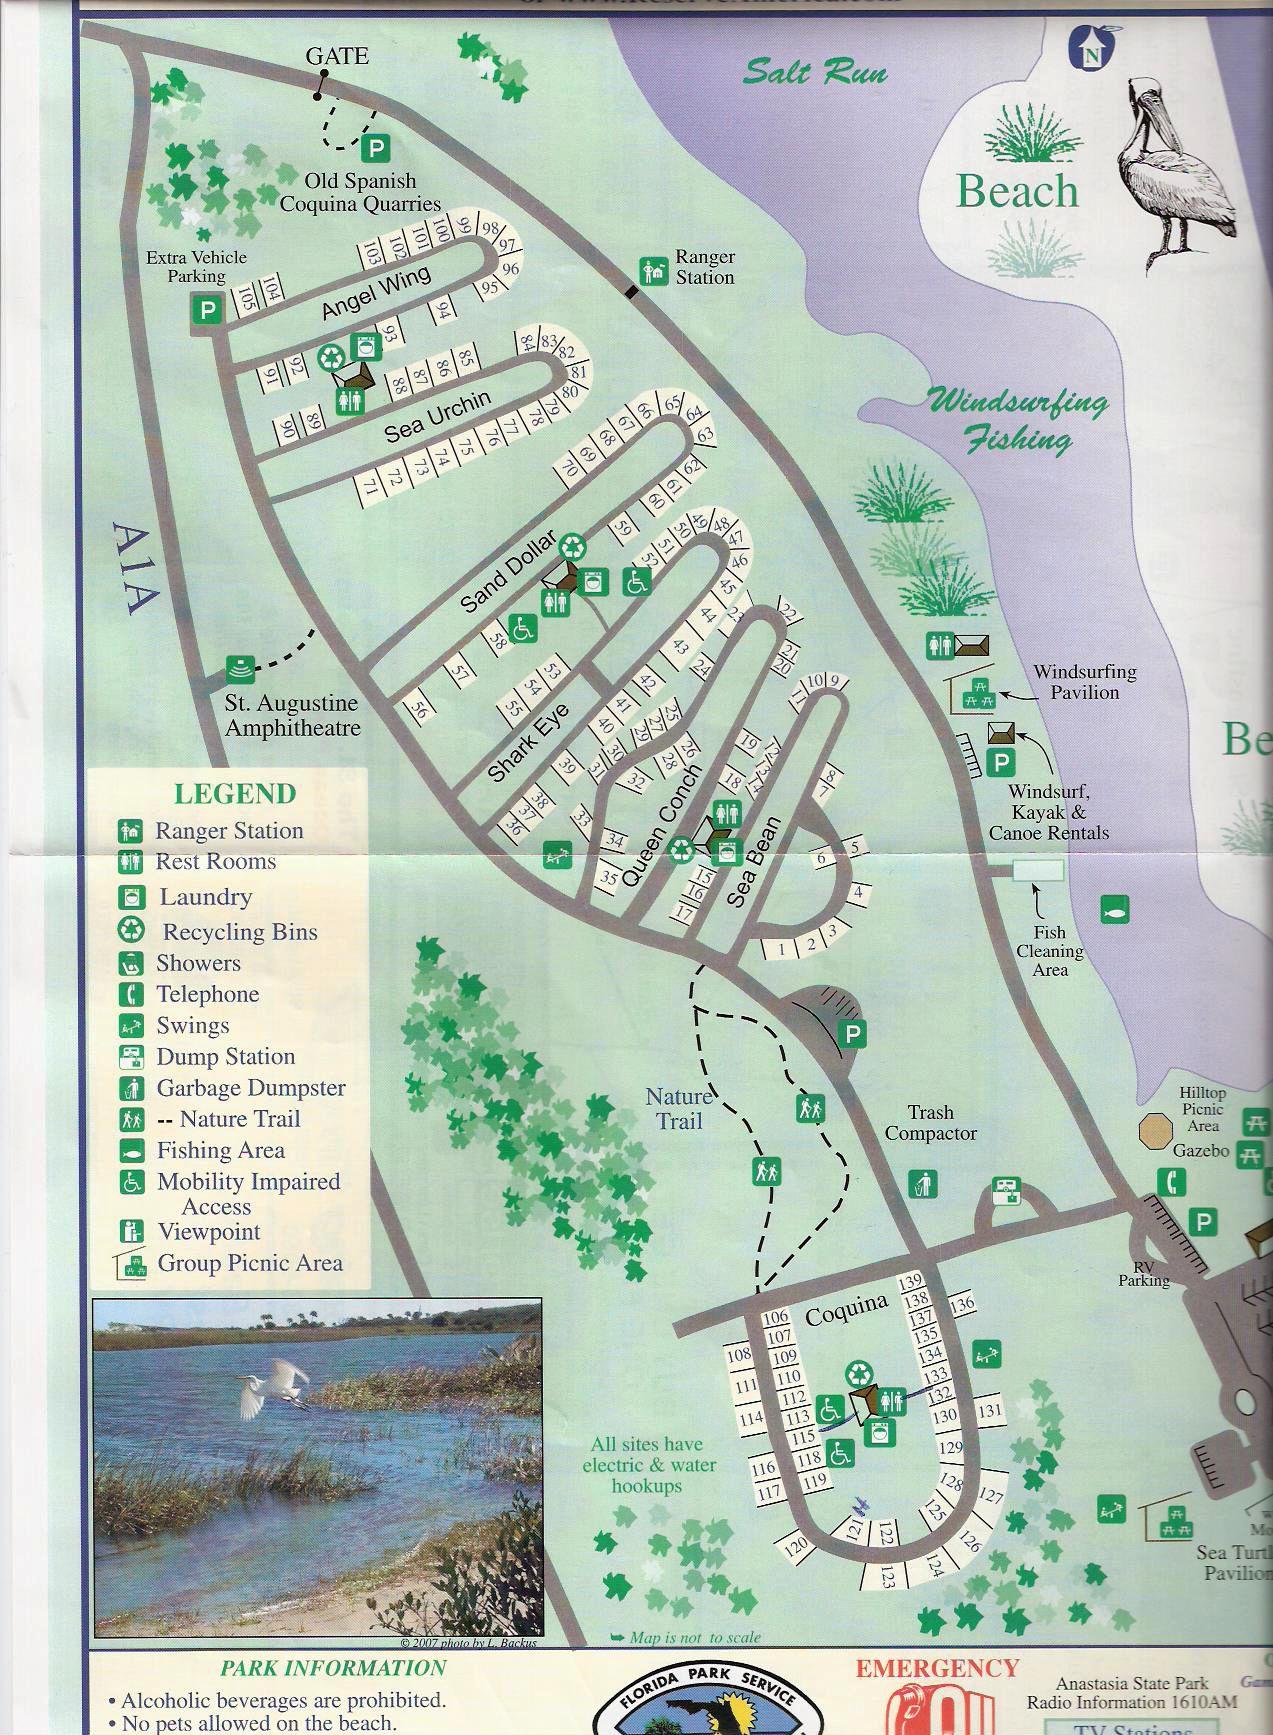 Campground Map - Anastasia State Park - St. Augustine - Florida - Florida State Campgrounds Map